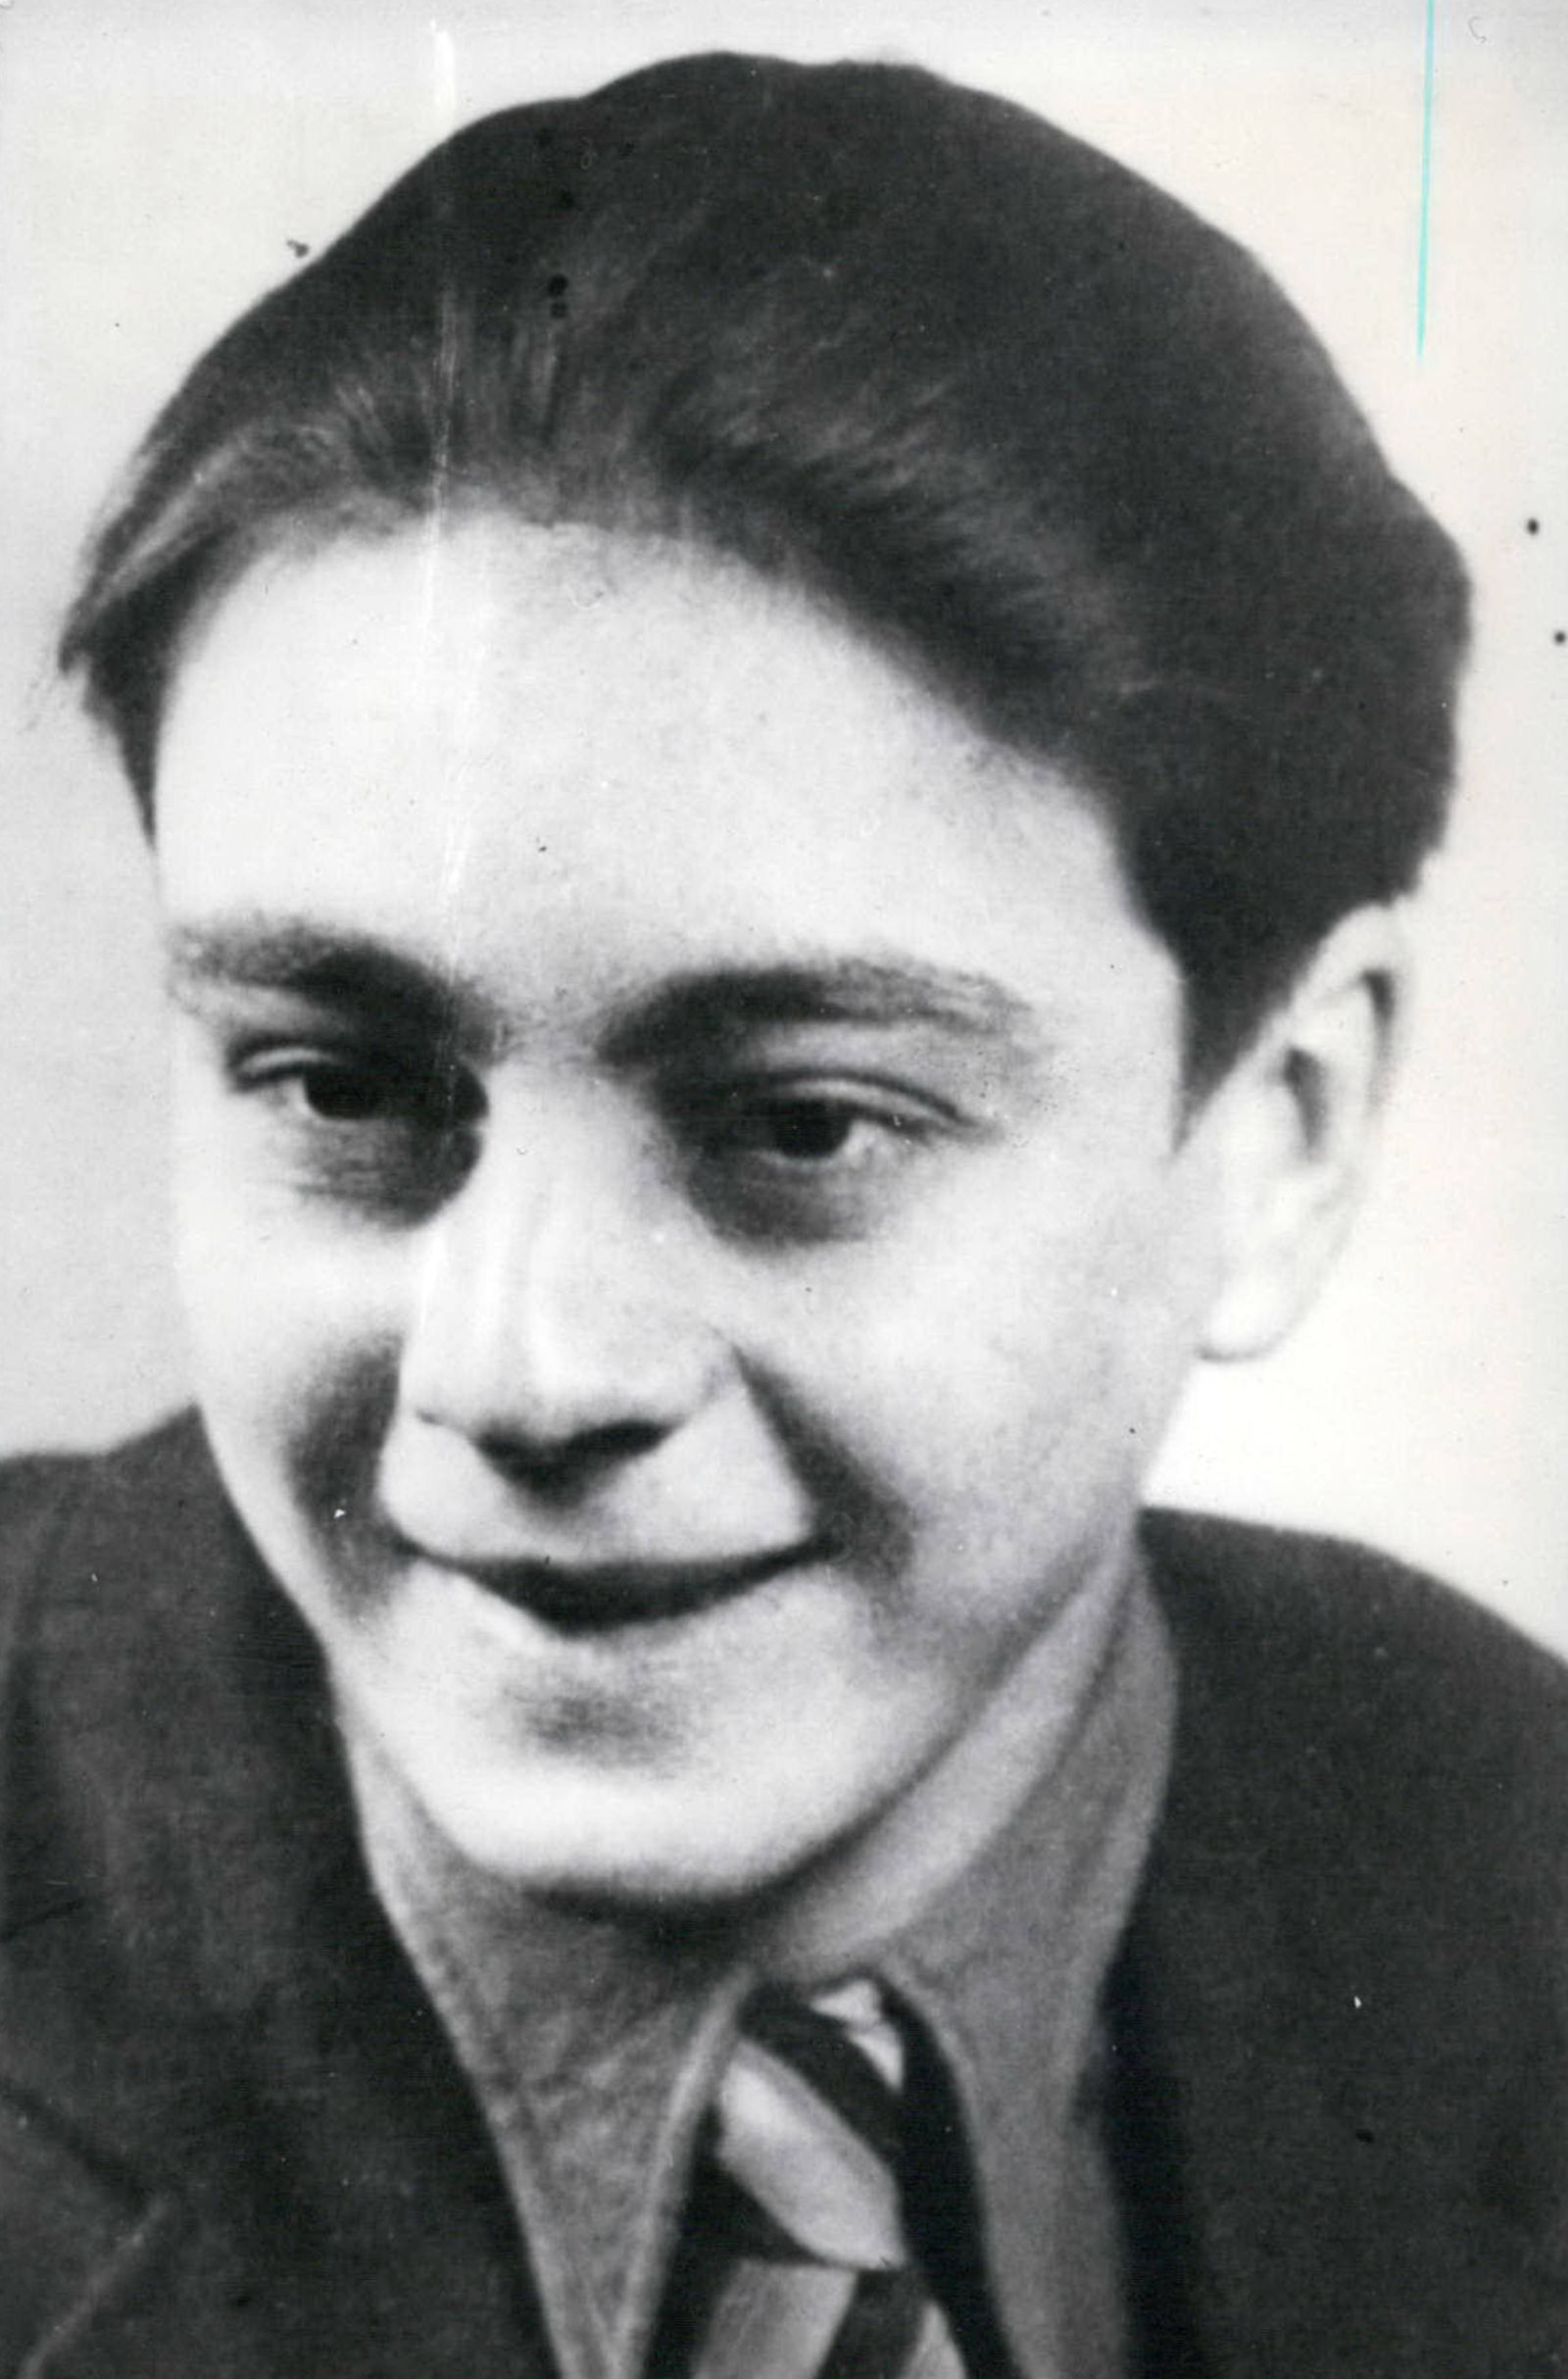 Dec 12 1960 Free after ten years of convict prison Hermann Josef Flade former school boy in